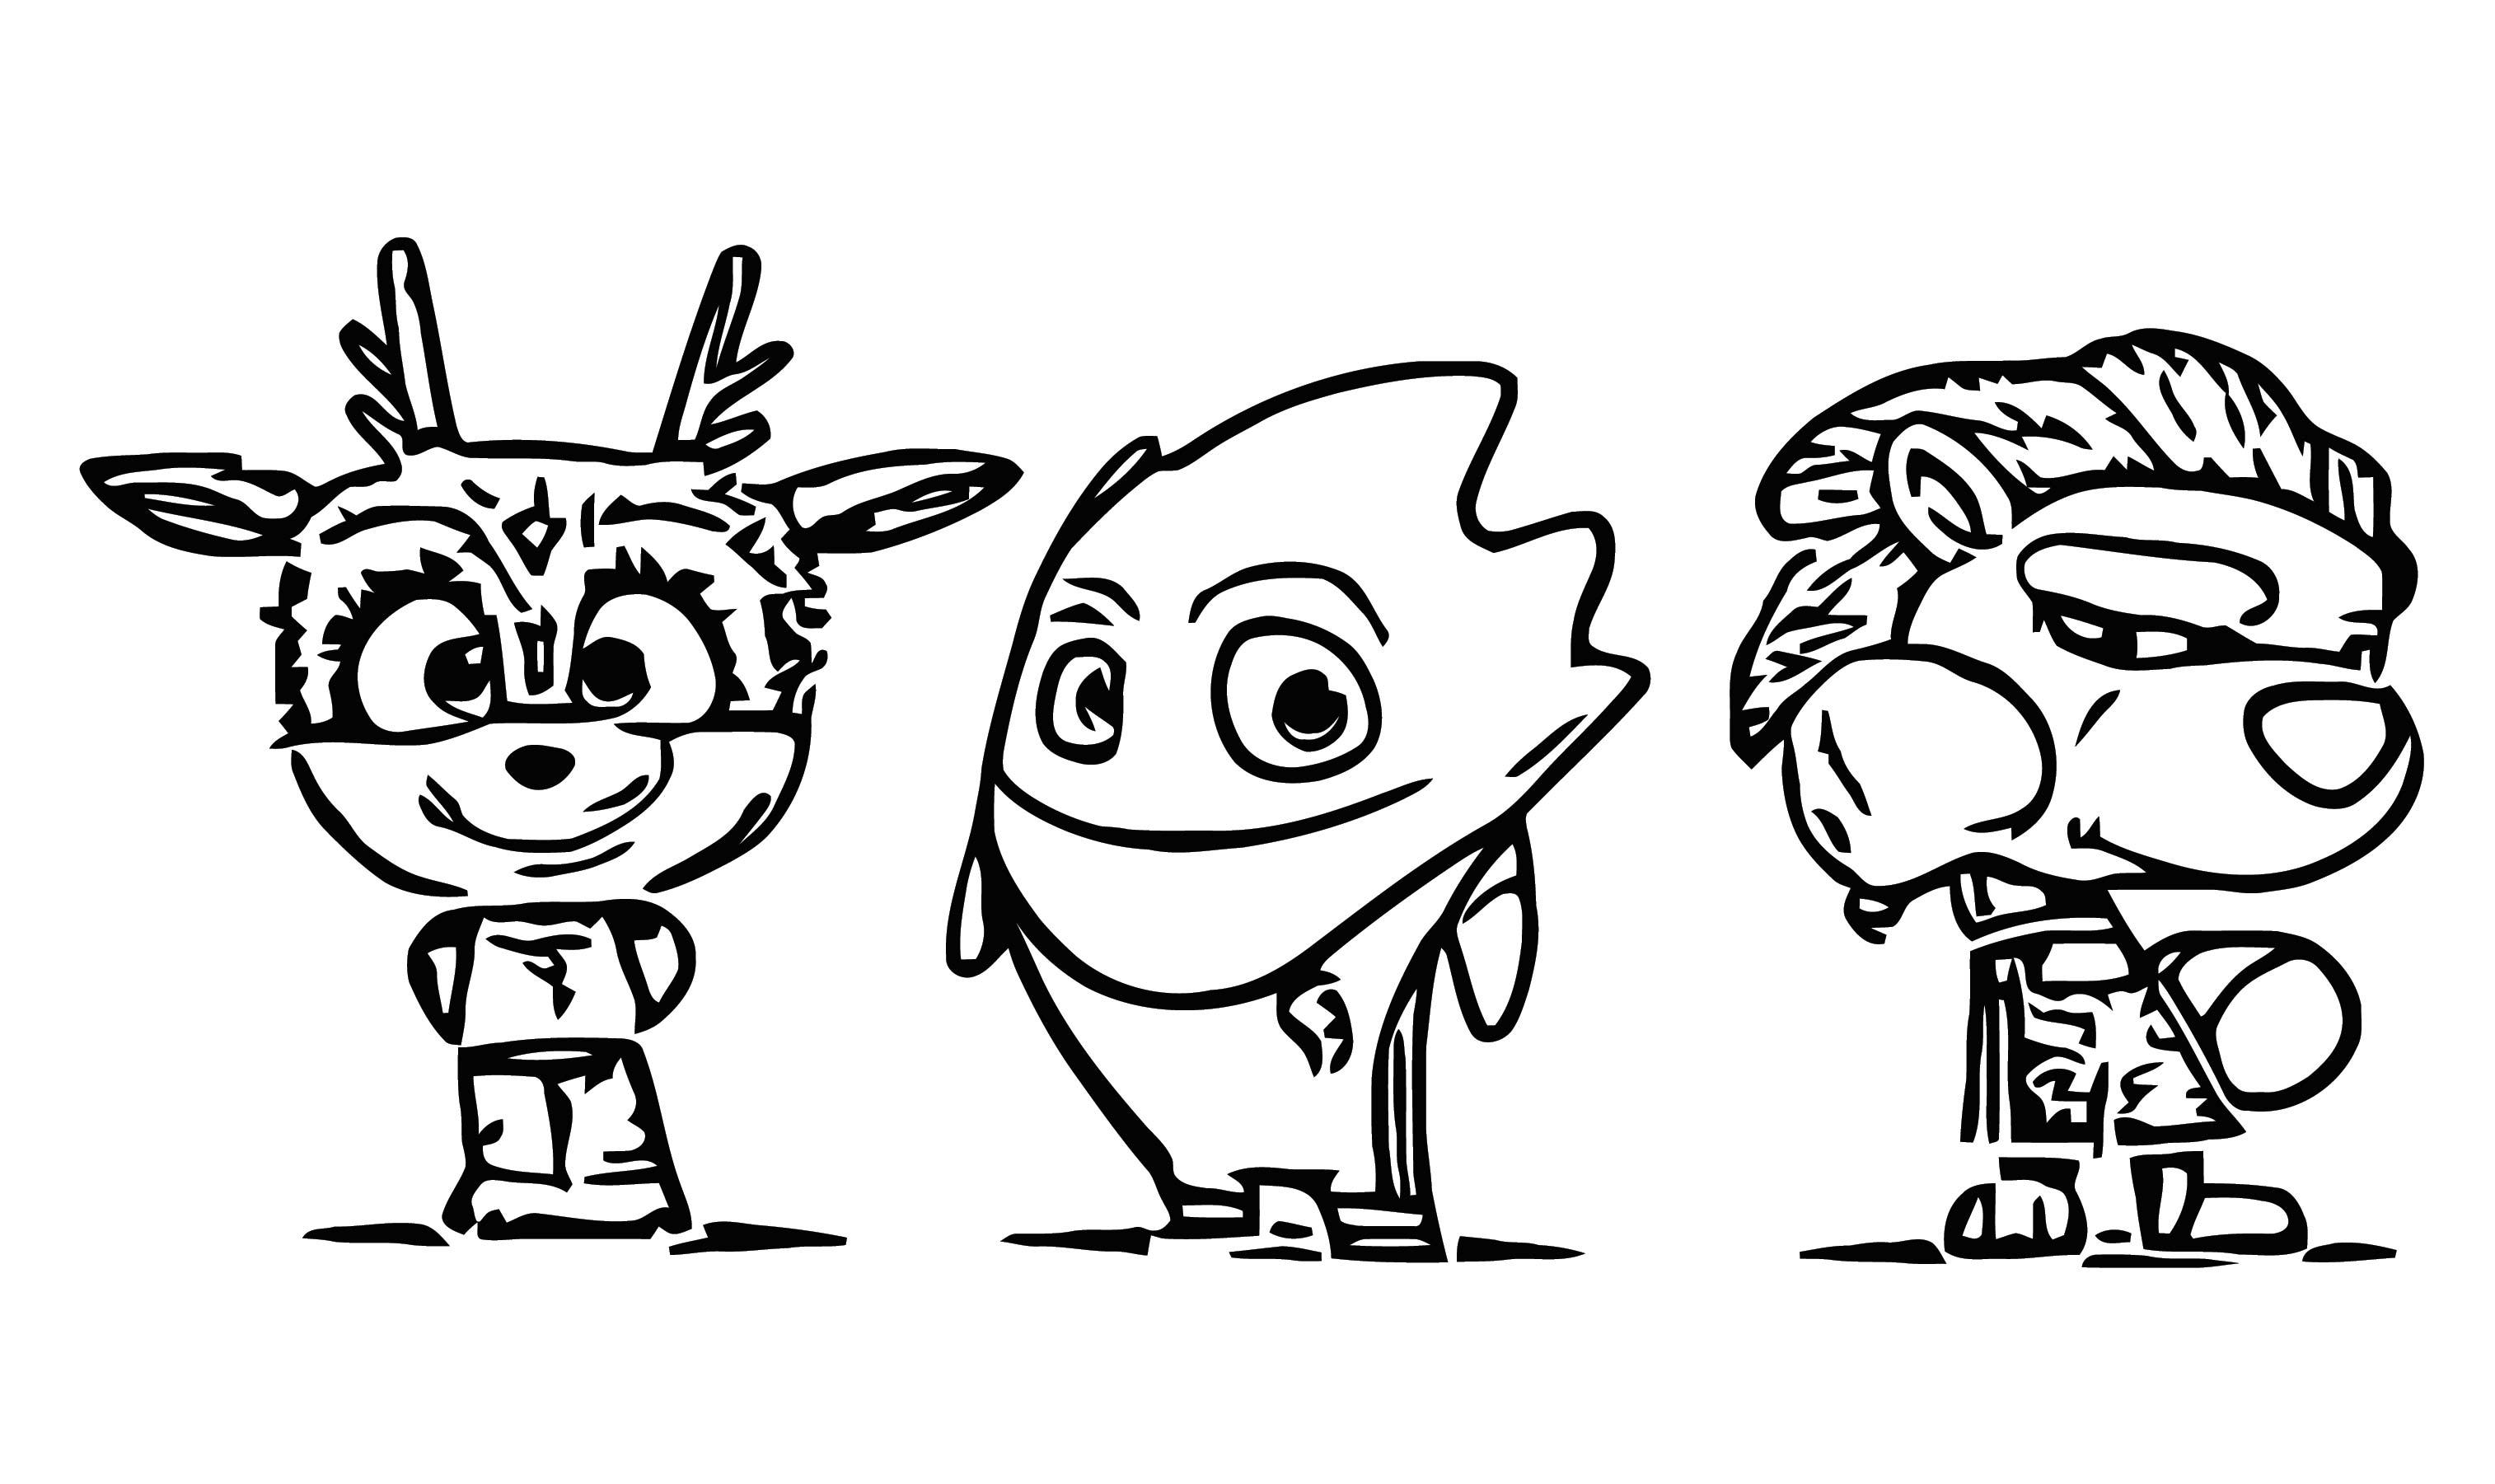 Juegos Panamericanos 3d Character Design 1 Cartoonize Coloring Page